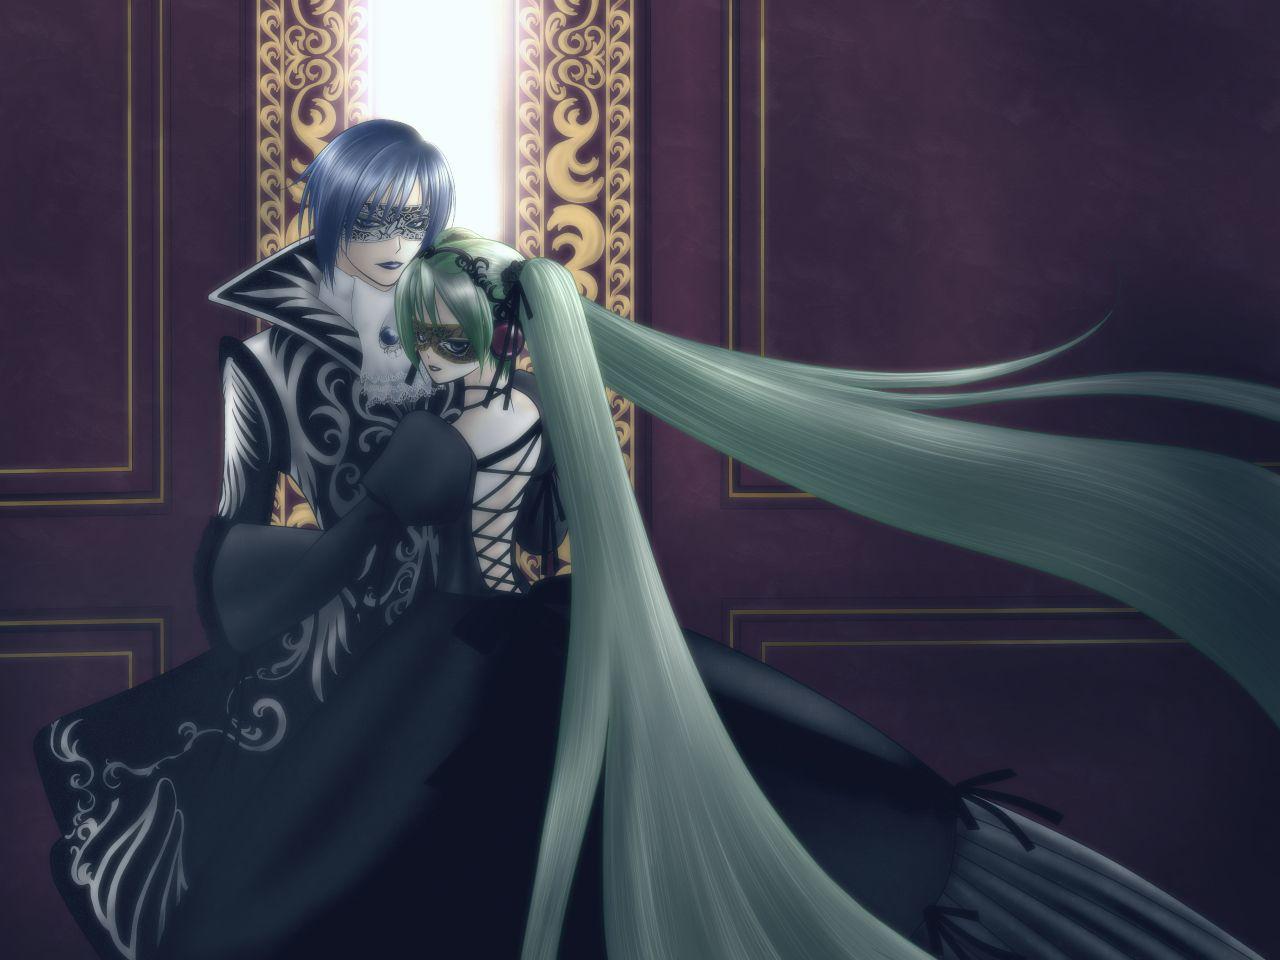 Kaito S Cantarella With Hatsune Miku Vocaloid Wiki Voice Synthesizer Kaito Hatsune Miku Vocaloid